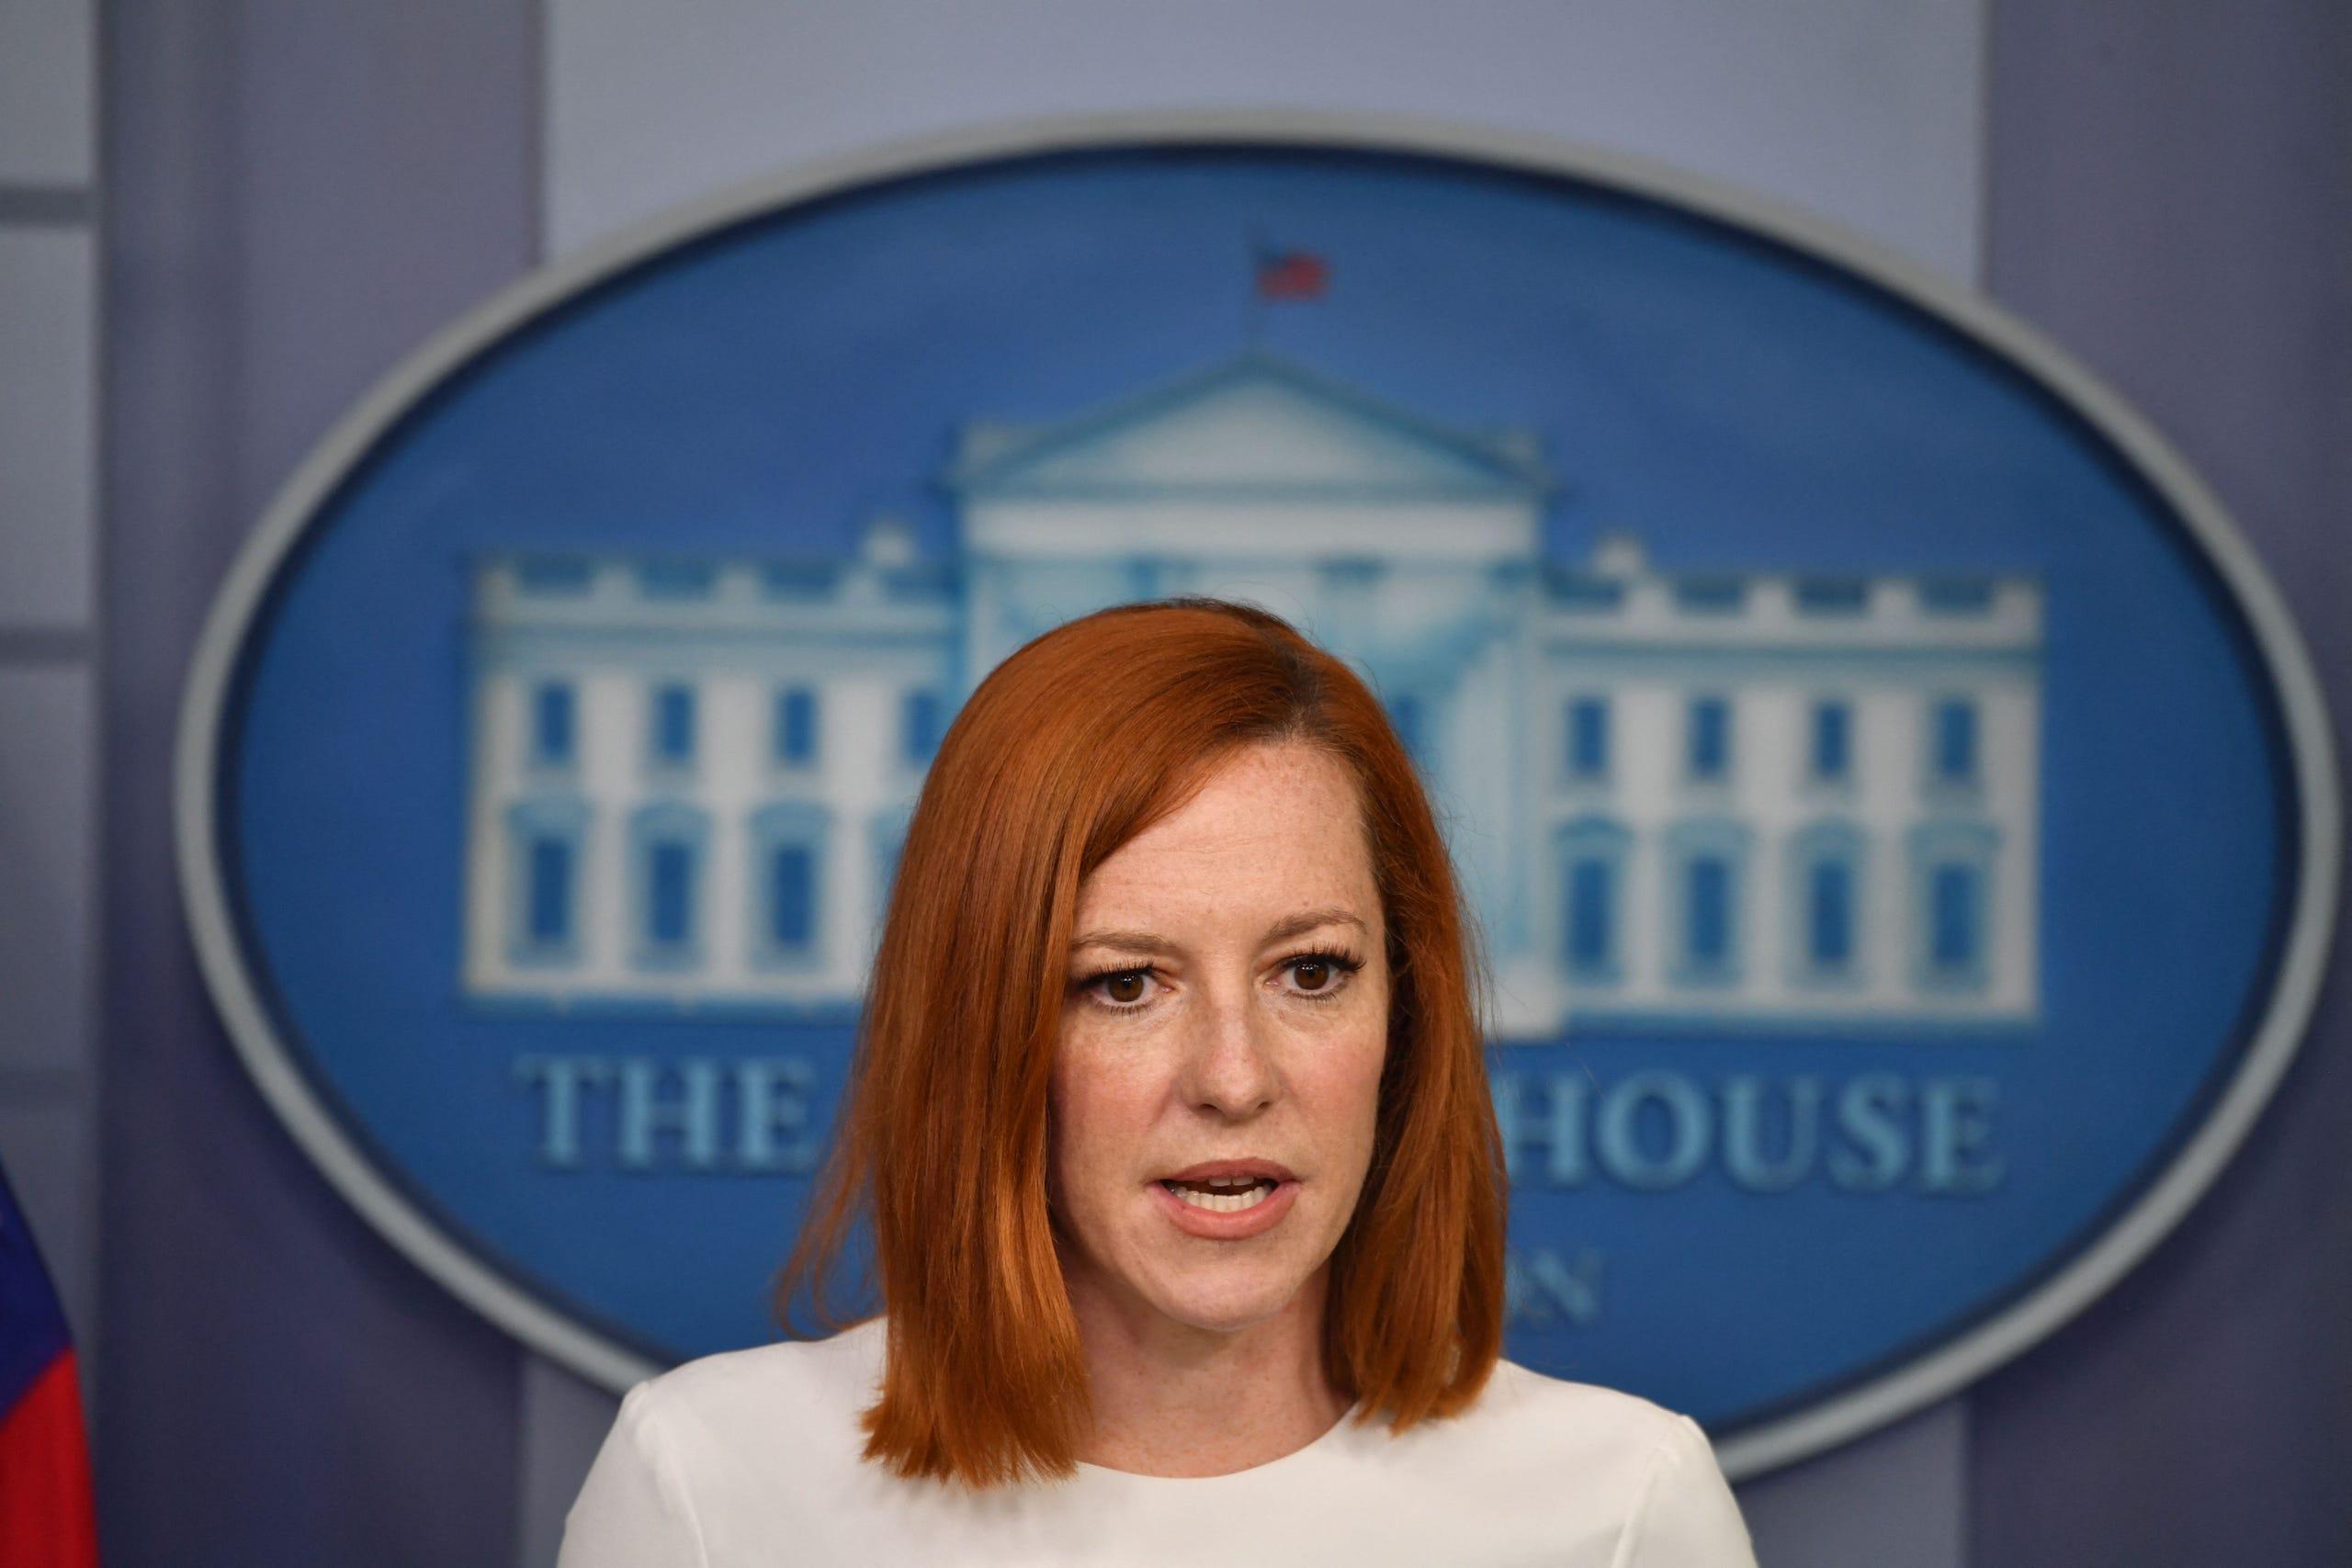 Jen Psaki, Biden's White House press secretary